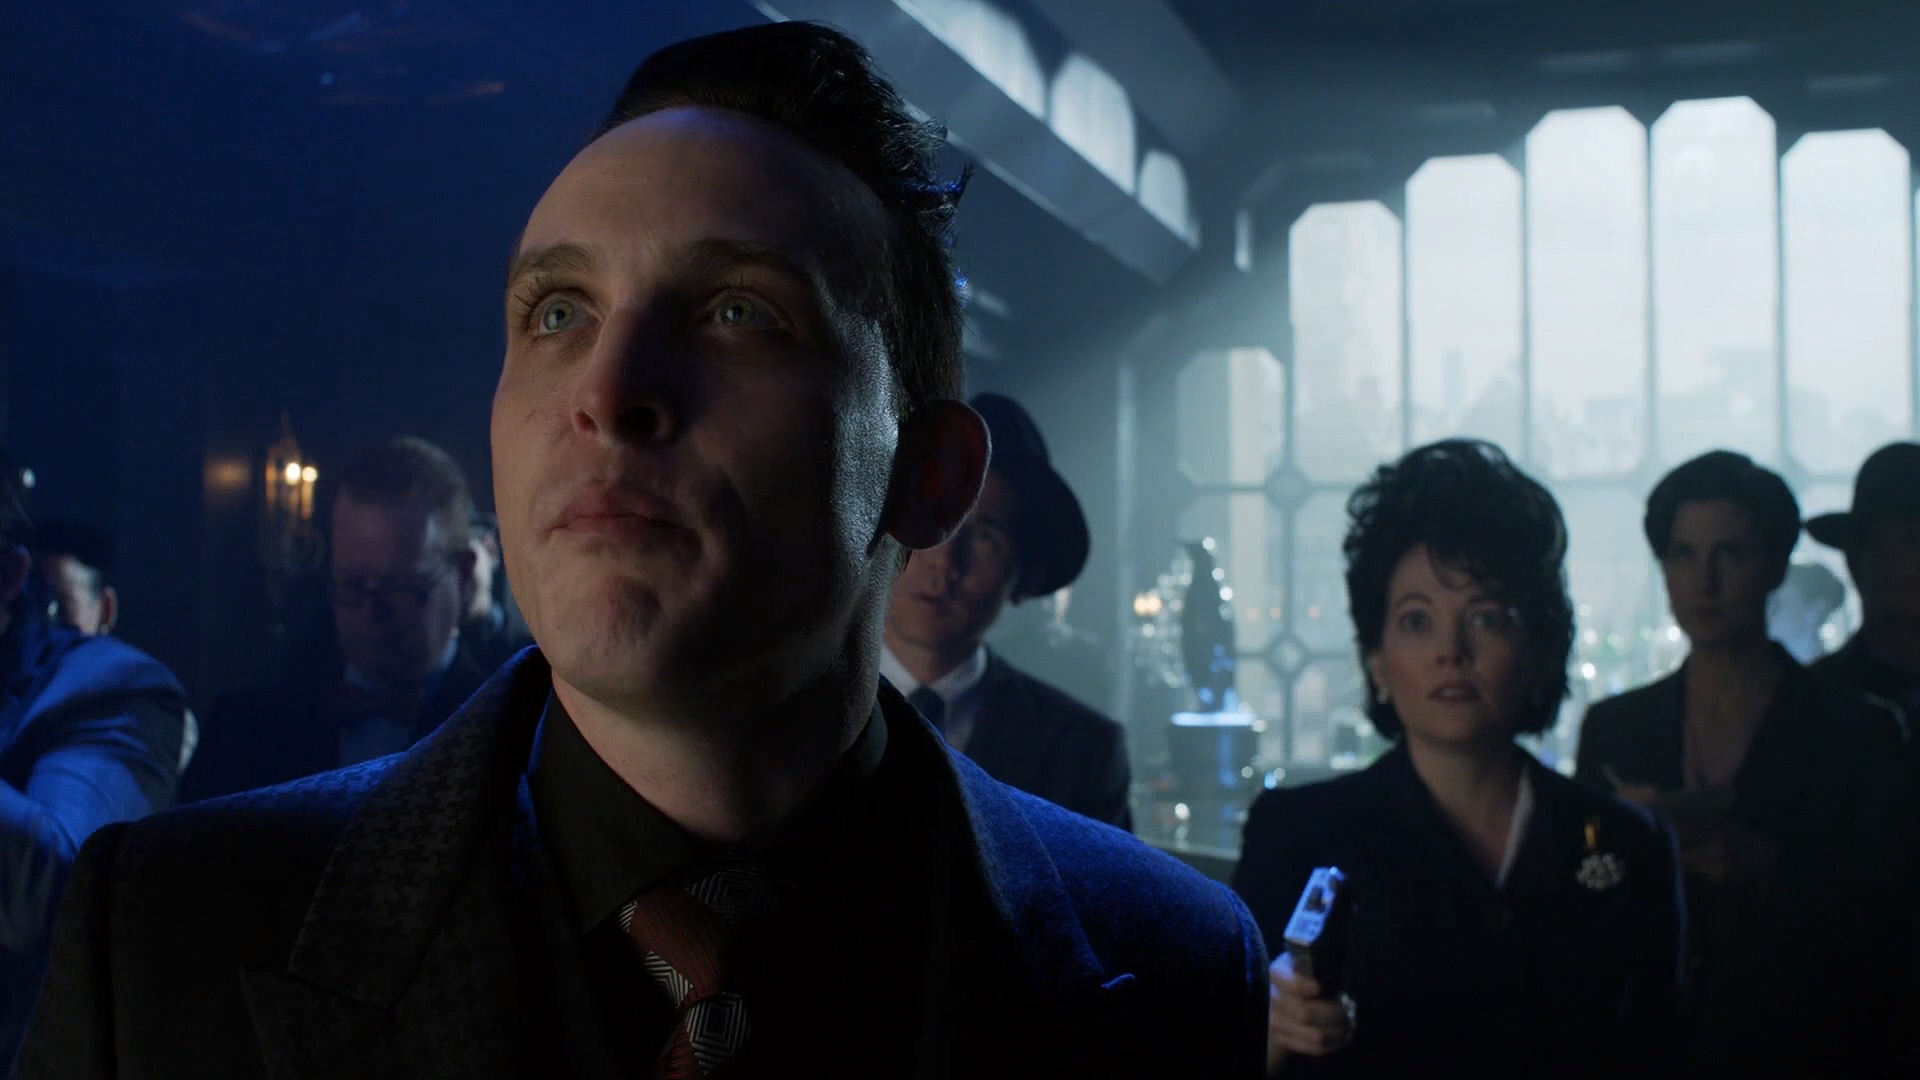 Готэм / Gotham [04x01-06 из 22] (2017) WEB-DLRip 1080p   IdeaFilm